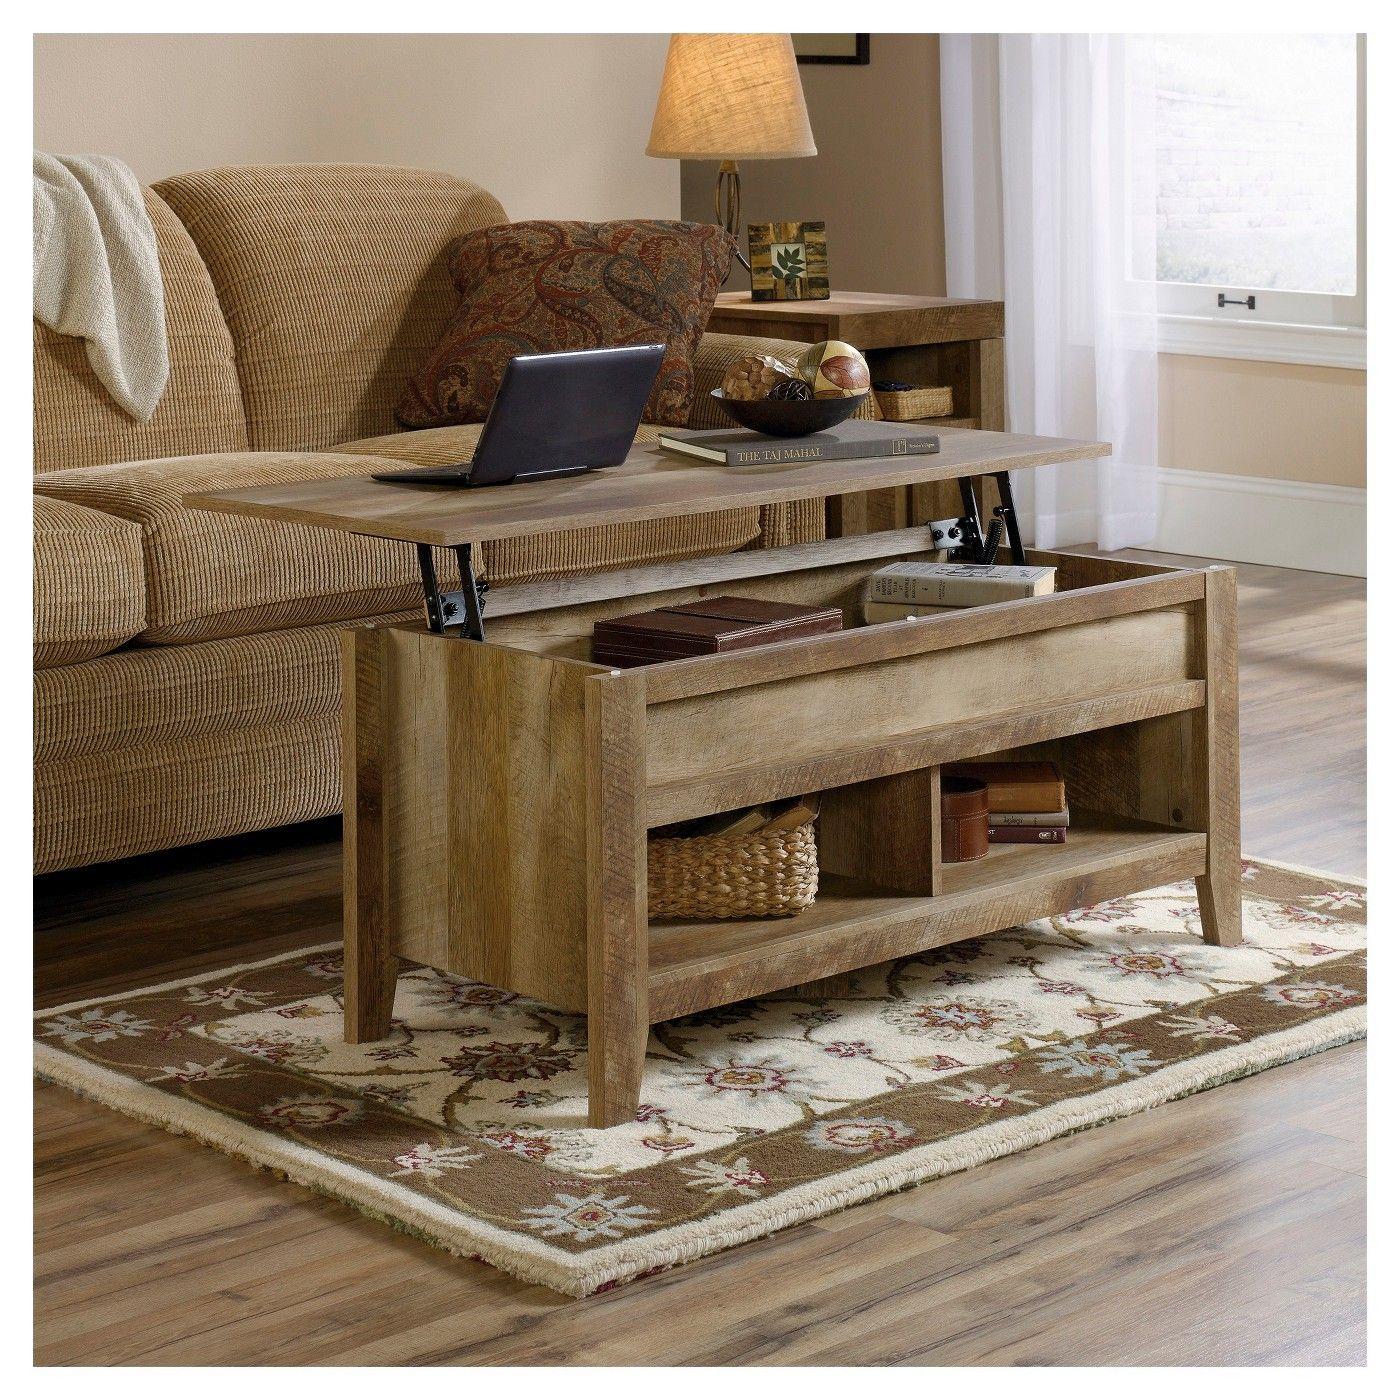 Dakota Pass Lift Top Coffee Table Craftsman Oak Sauder Coffee Table Farmhouse Coffee Table Wood Coffee Table [ 1400 x 1400 Pixel ]